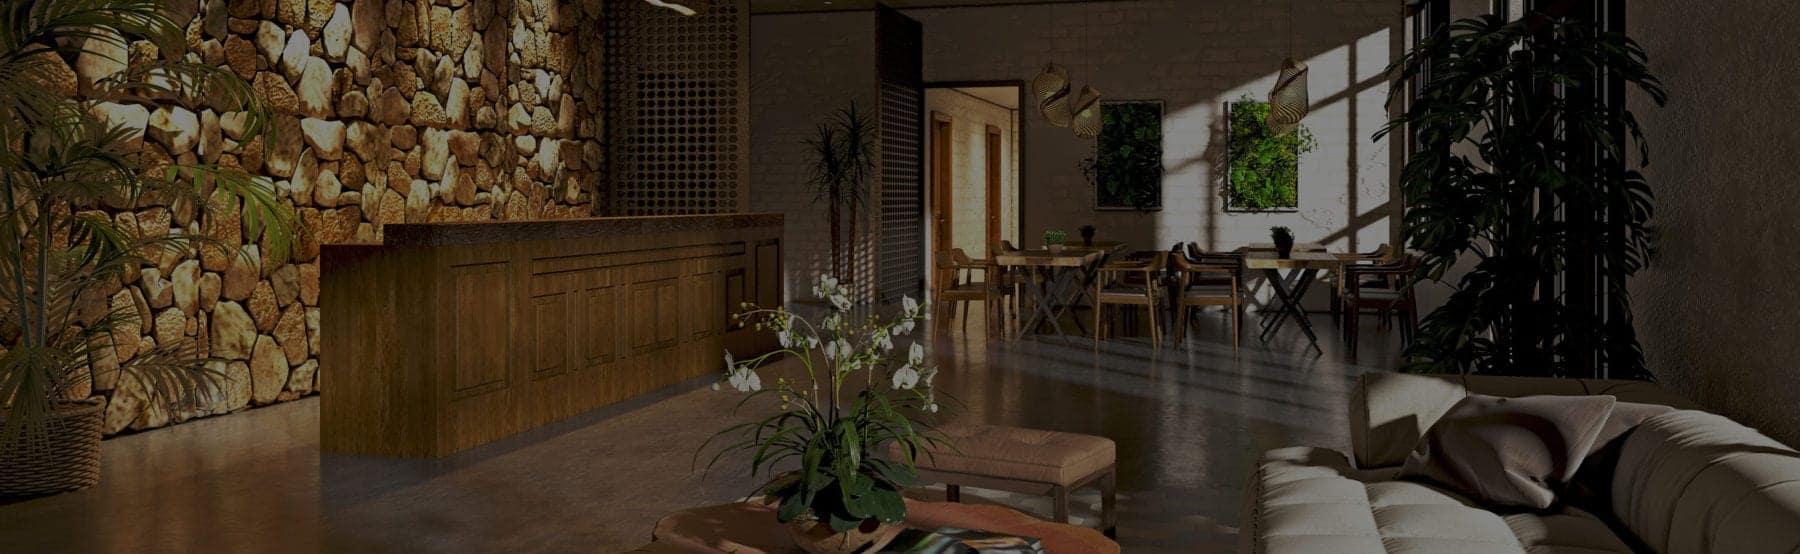 Commercial-interior-design-art-services